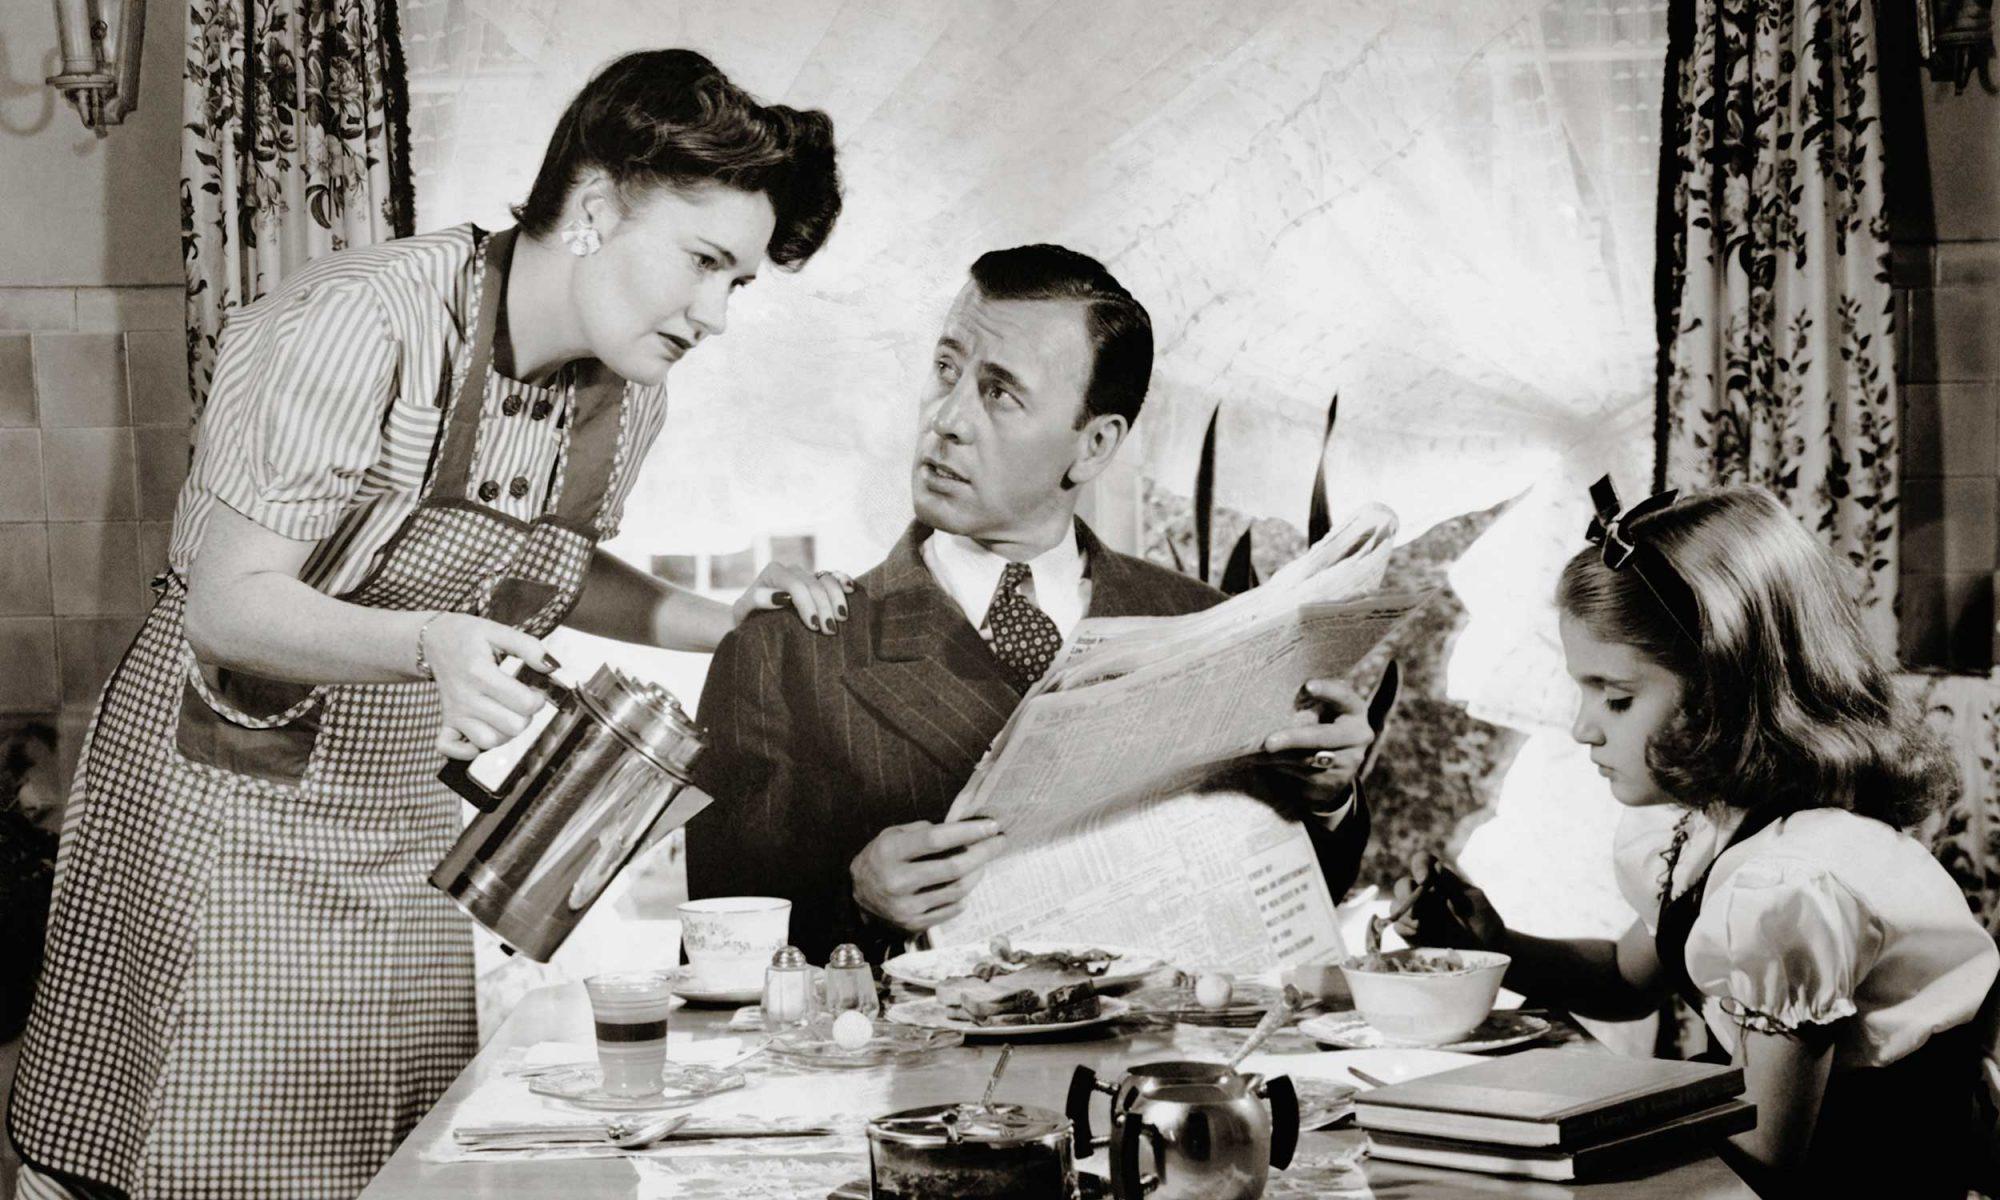 EC: North Dakota Lawmakers Say Women Should Spend Sunday Making Breakfast for Their Husbands